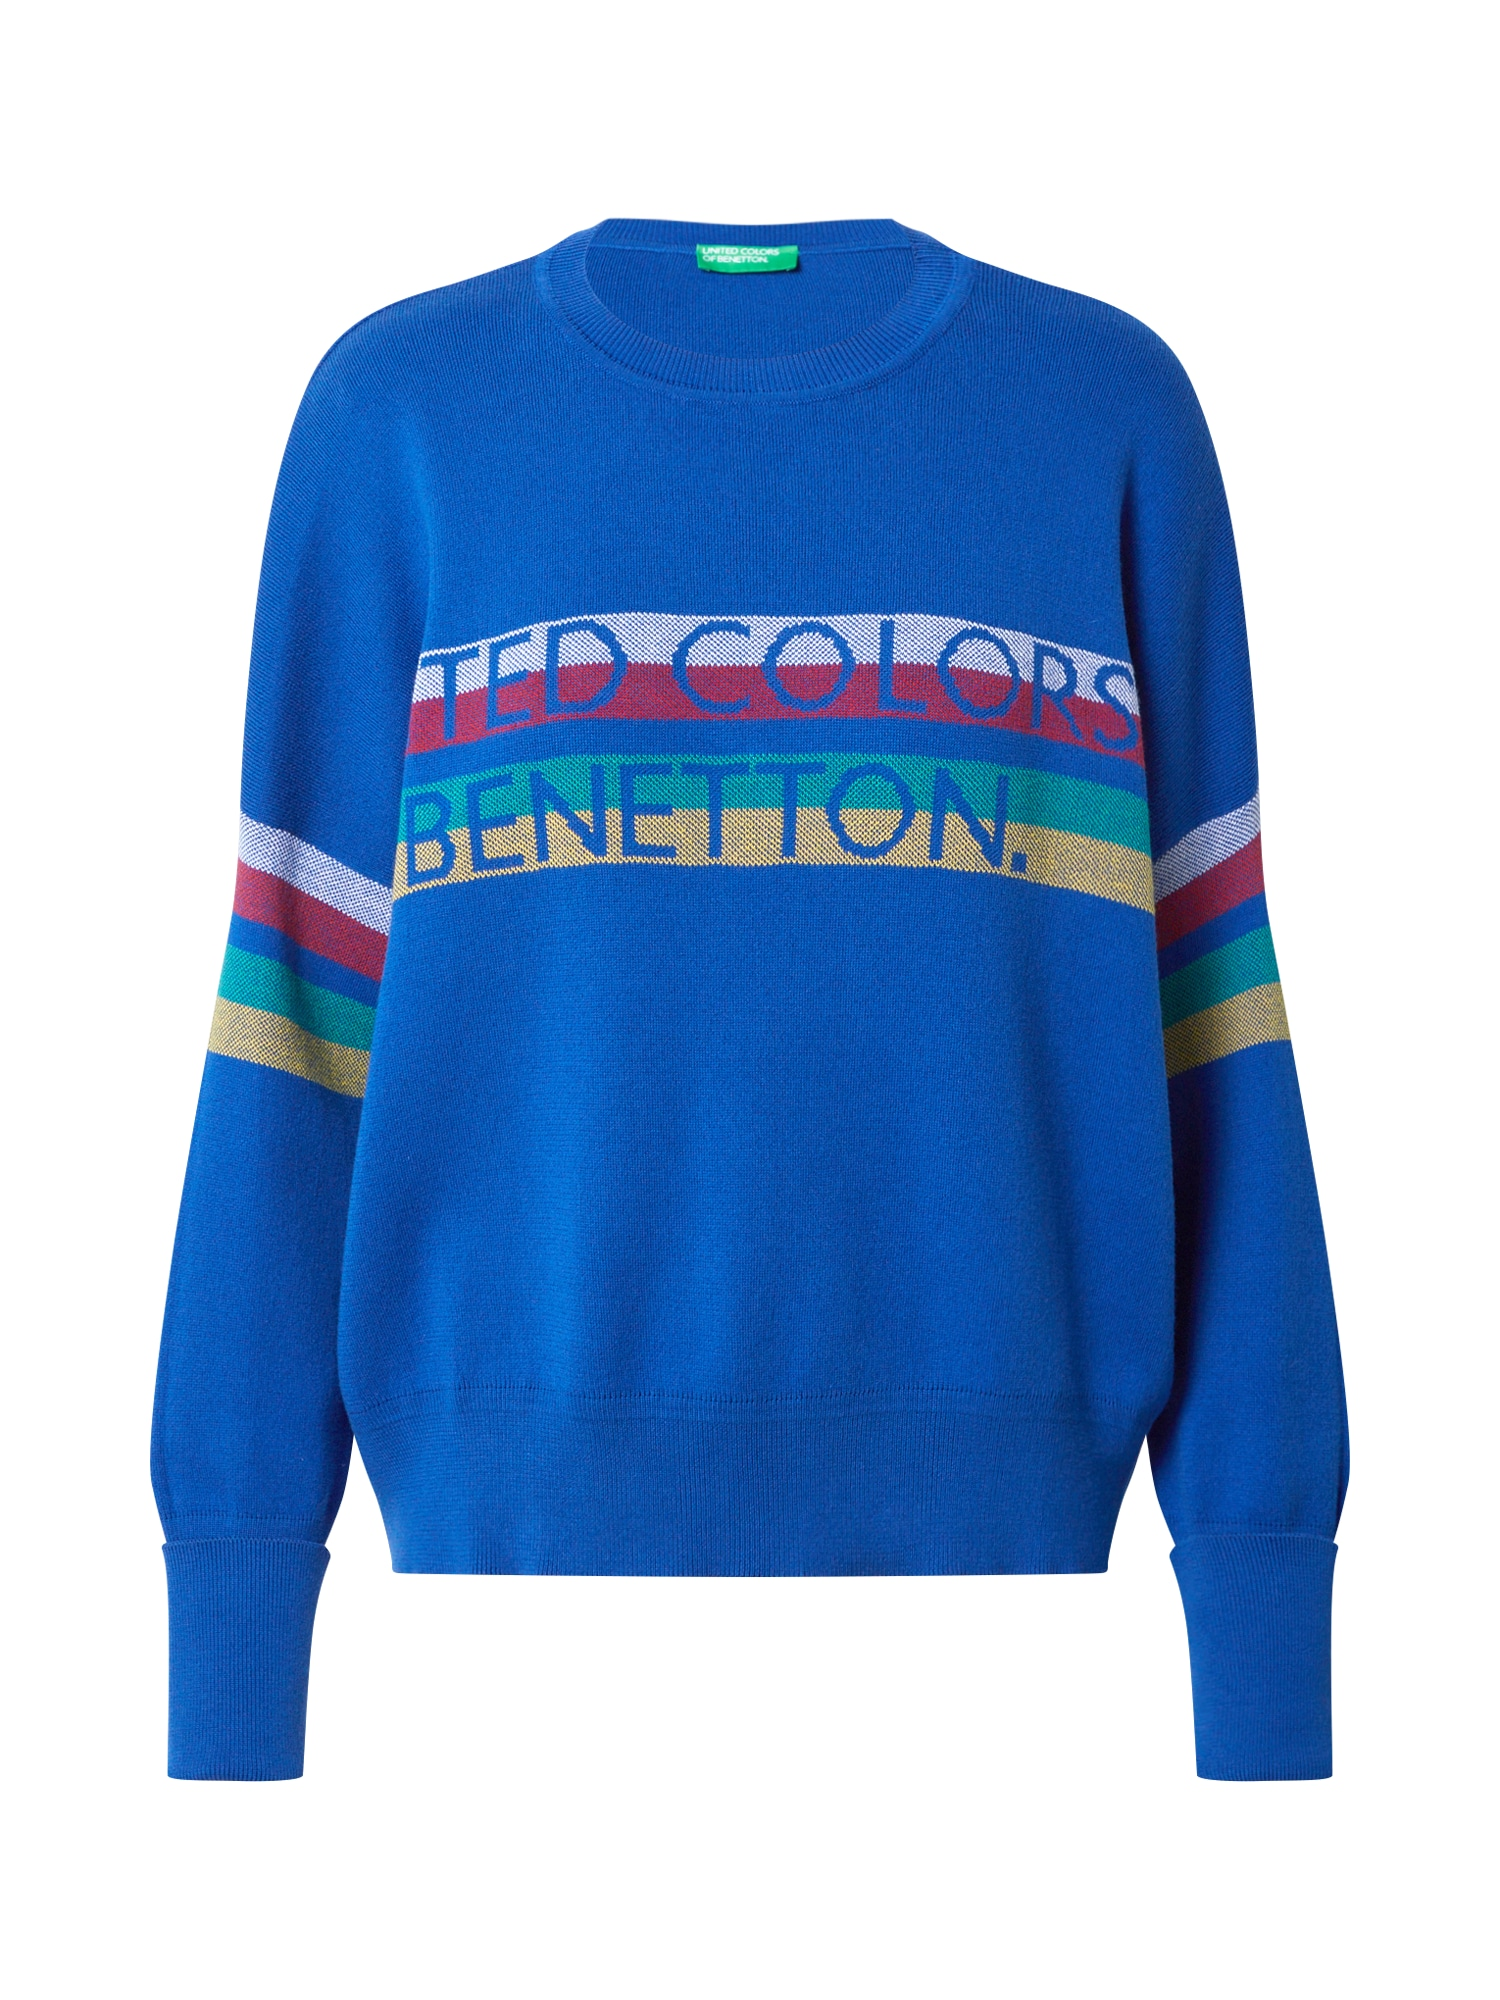 UNITED COLORS OF BENETTON Svetr  modrá / mix barev